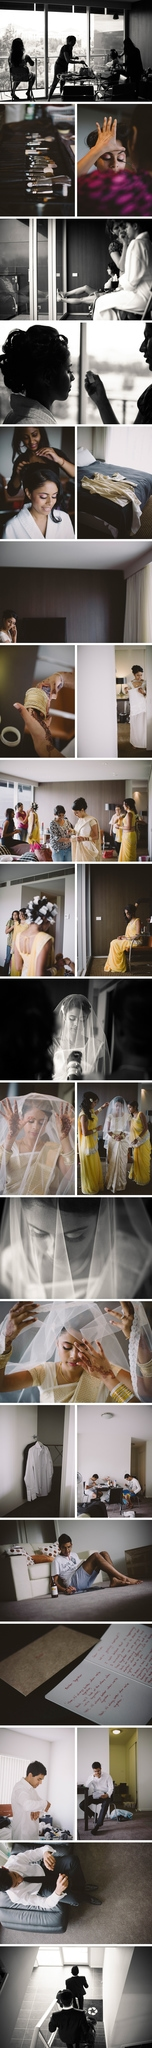 Canberra National Portrait Gallery Wedding Photos